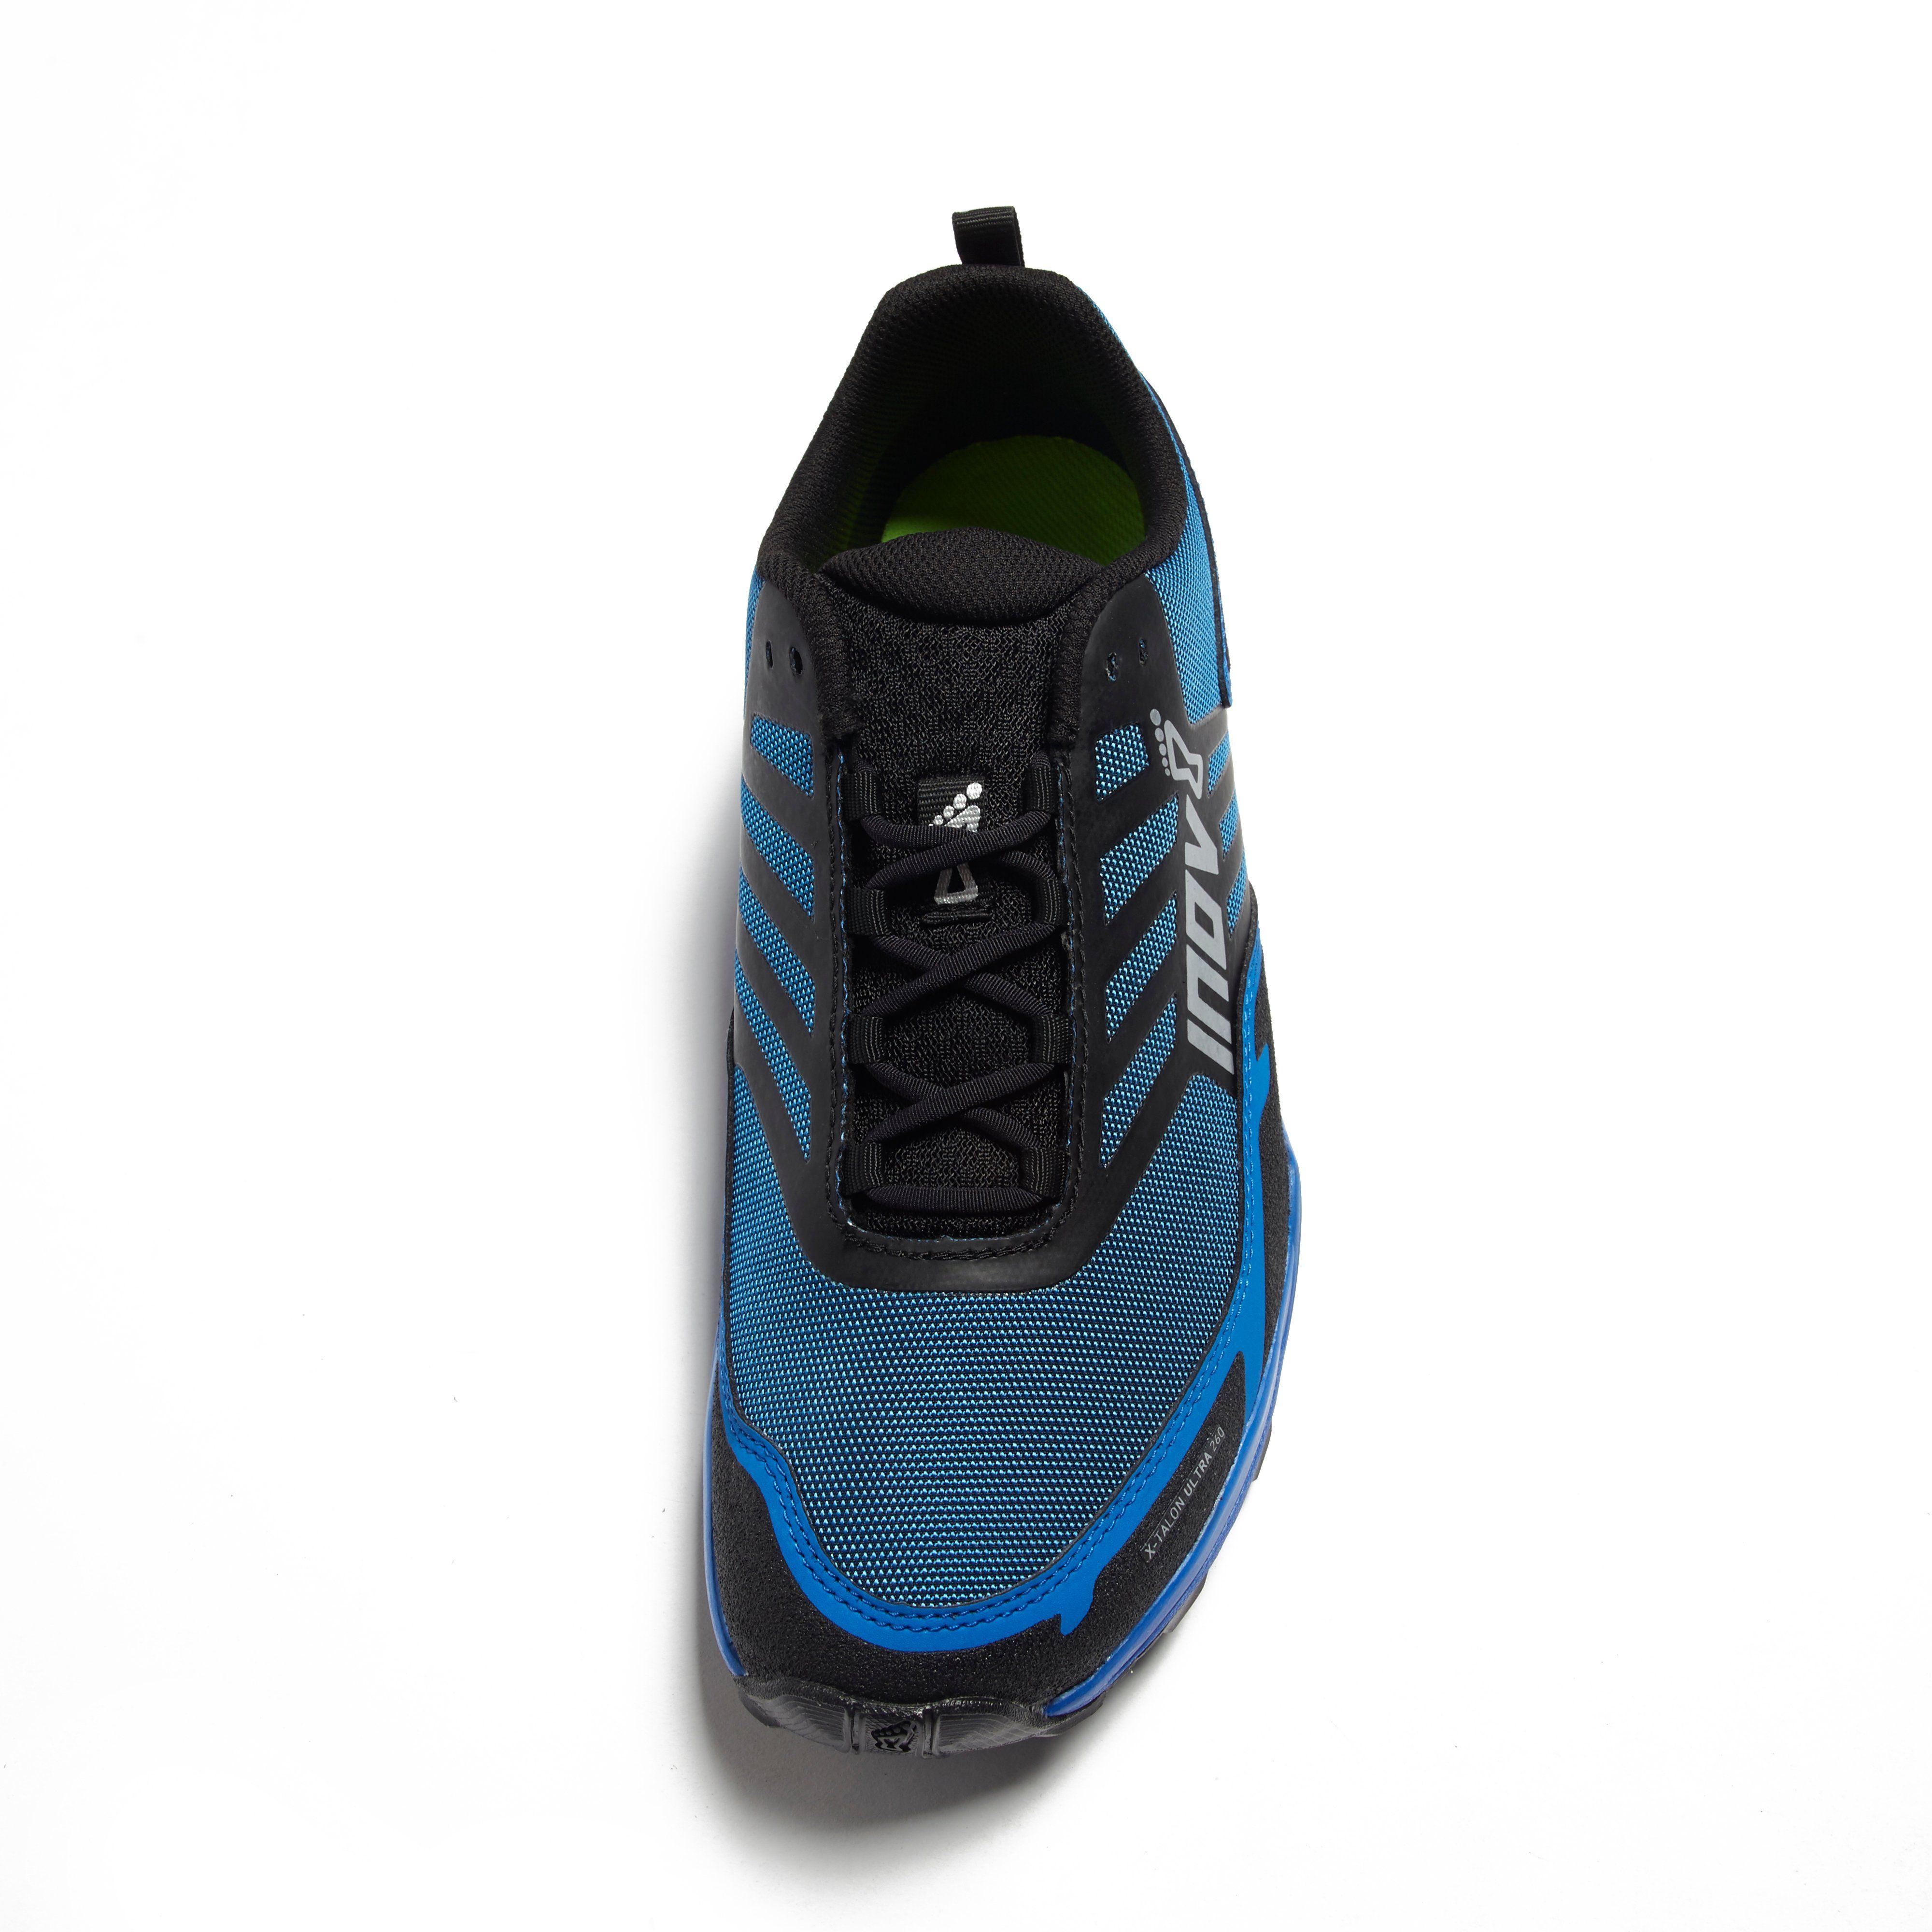 Inov-8 X-Talon 260 Ultra Men's Trail Running Shoes